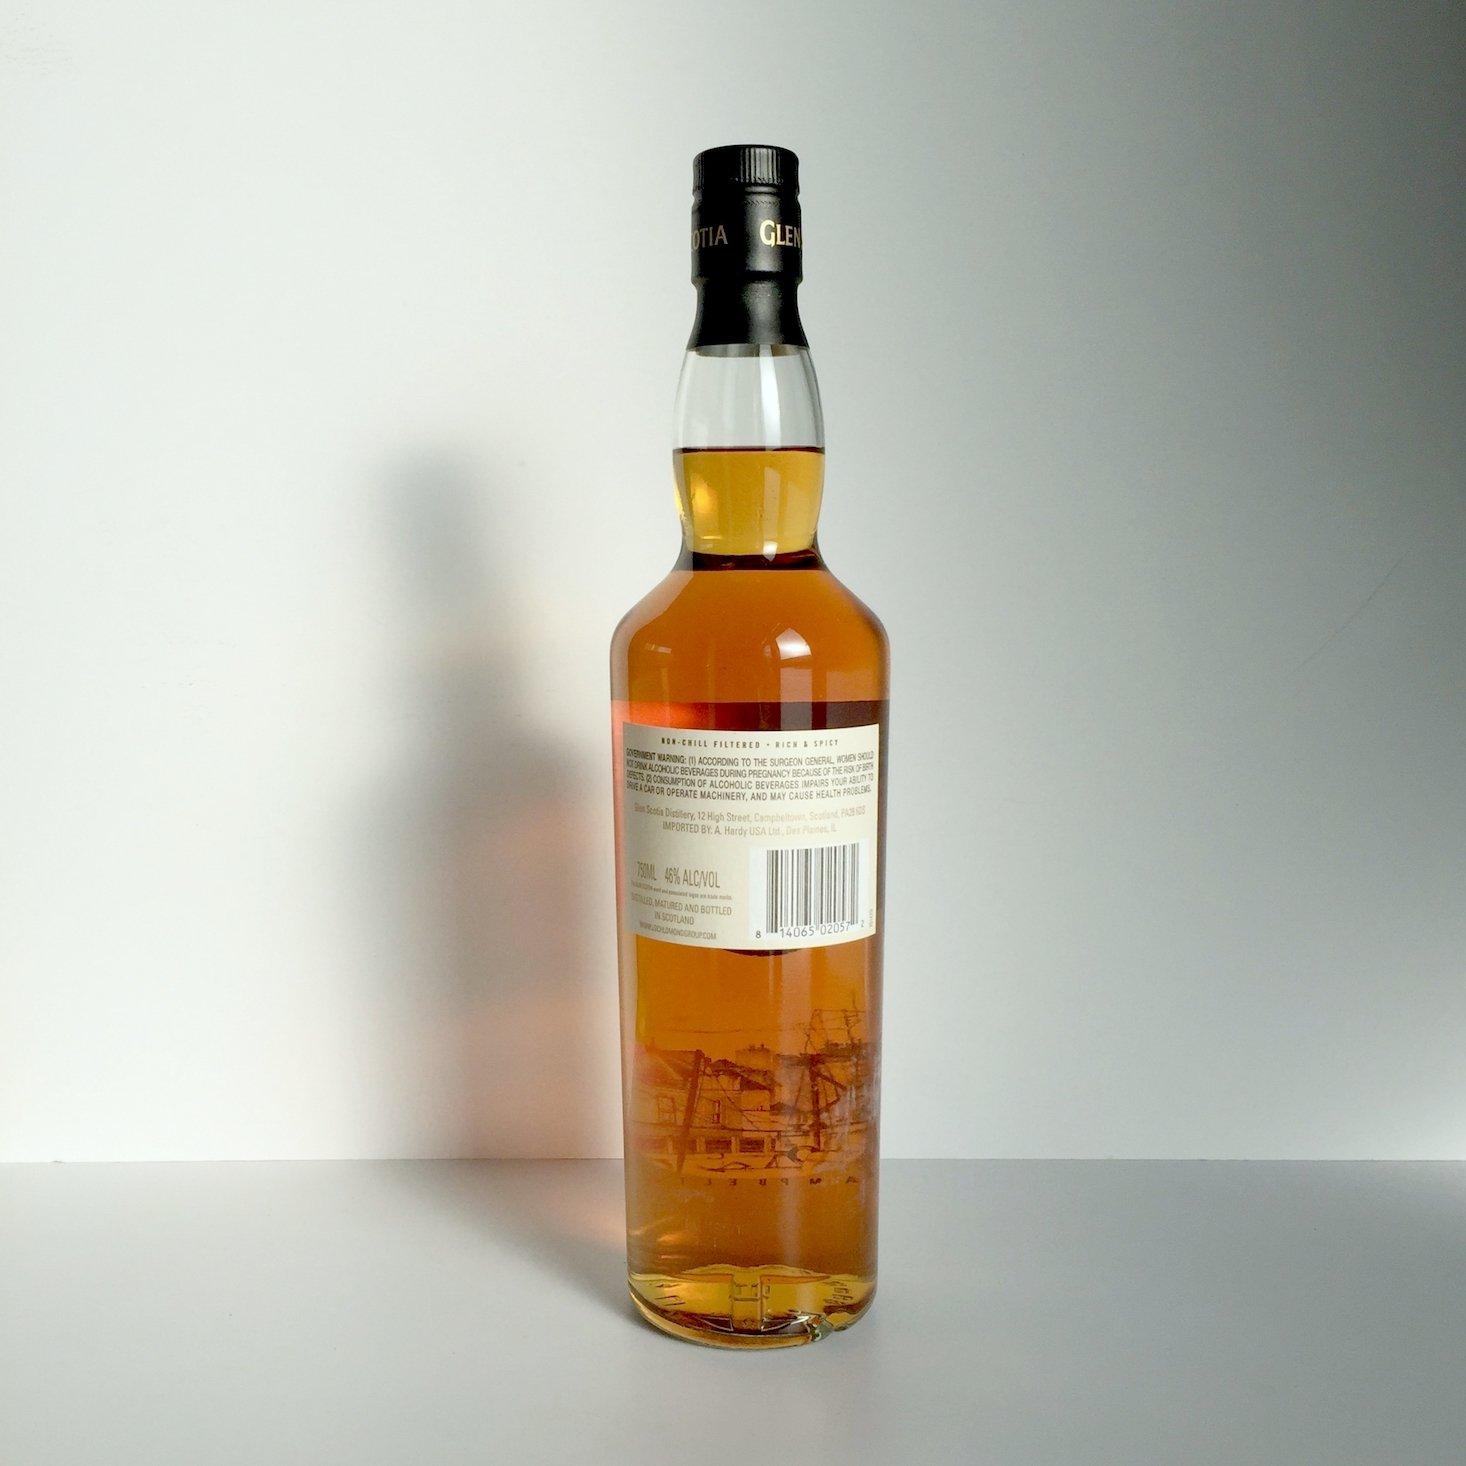 Taster's-club-january-2017-whisky-back